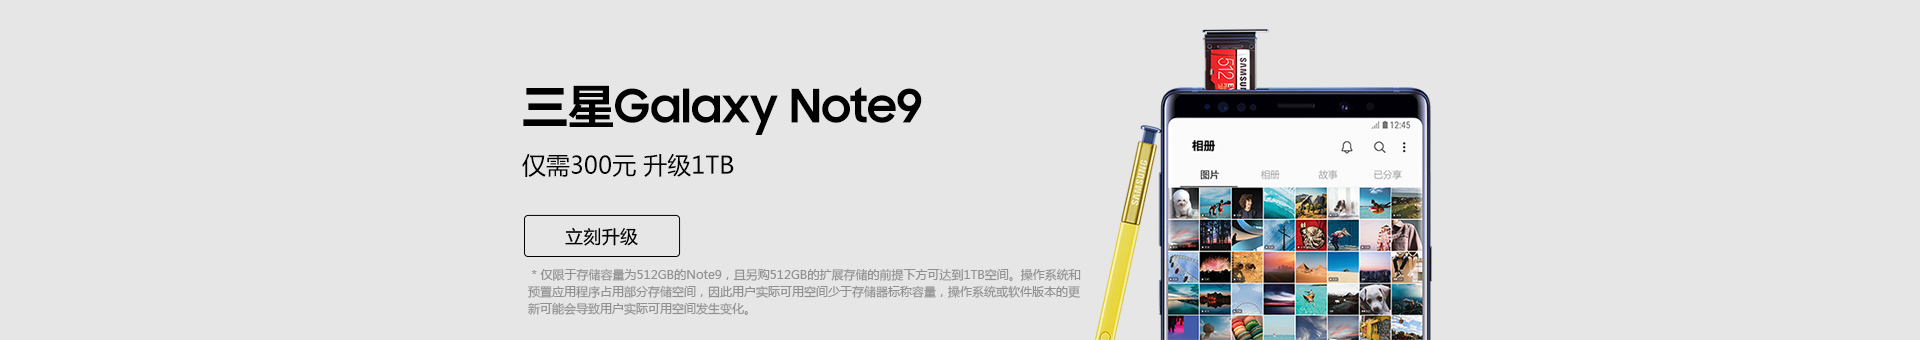 Galaxy Note9 1TB升级套装 仅需300元升级